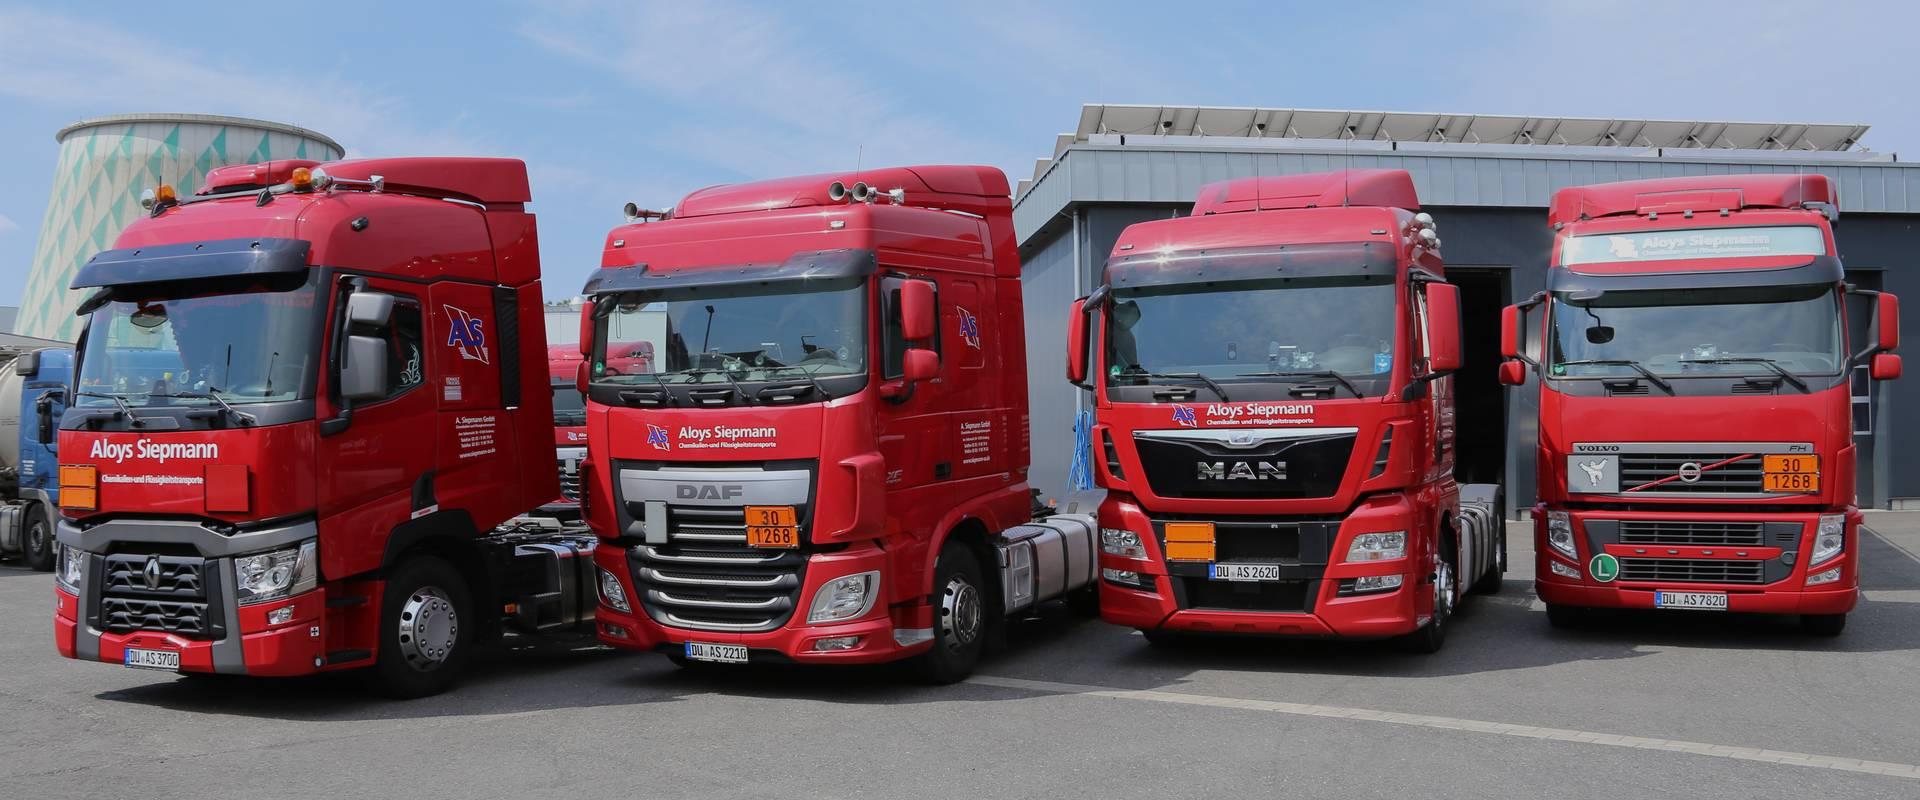 Nationaler-Internationaler-Transport-Chemiegueter-Siepmann-Spedition